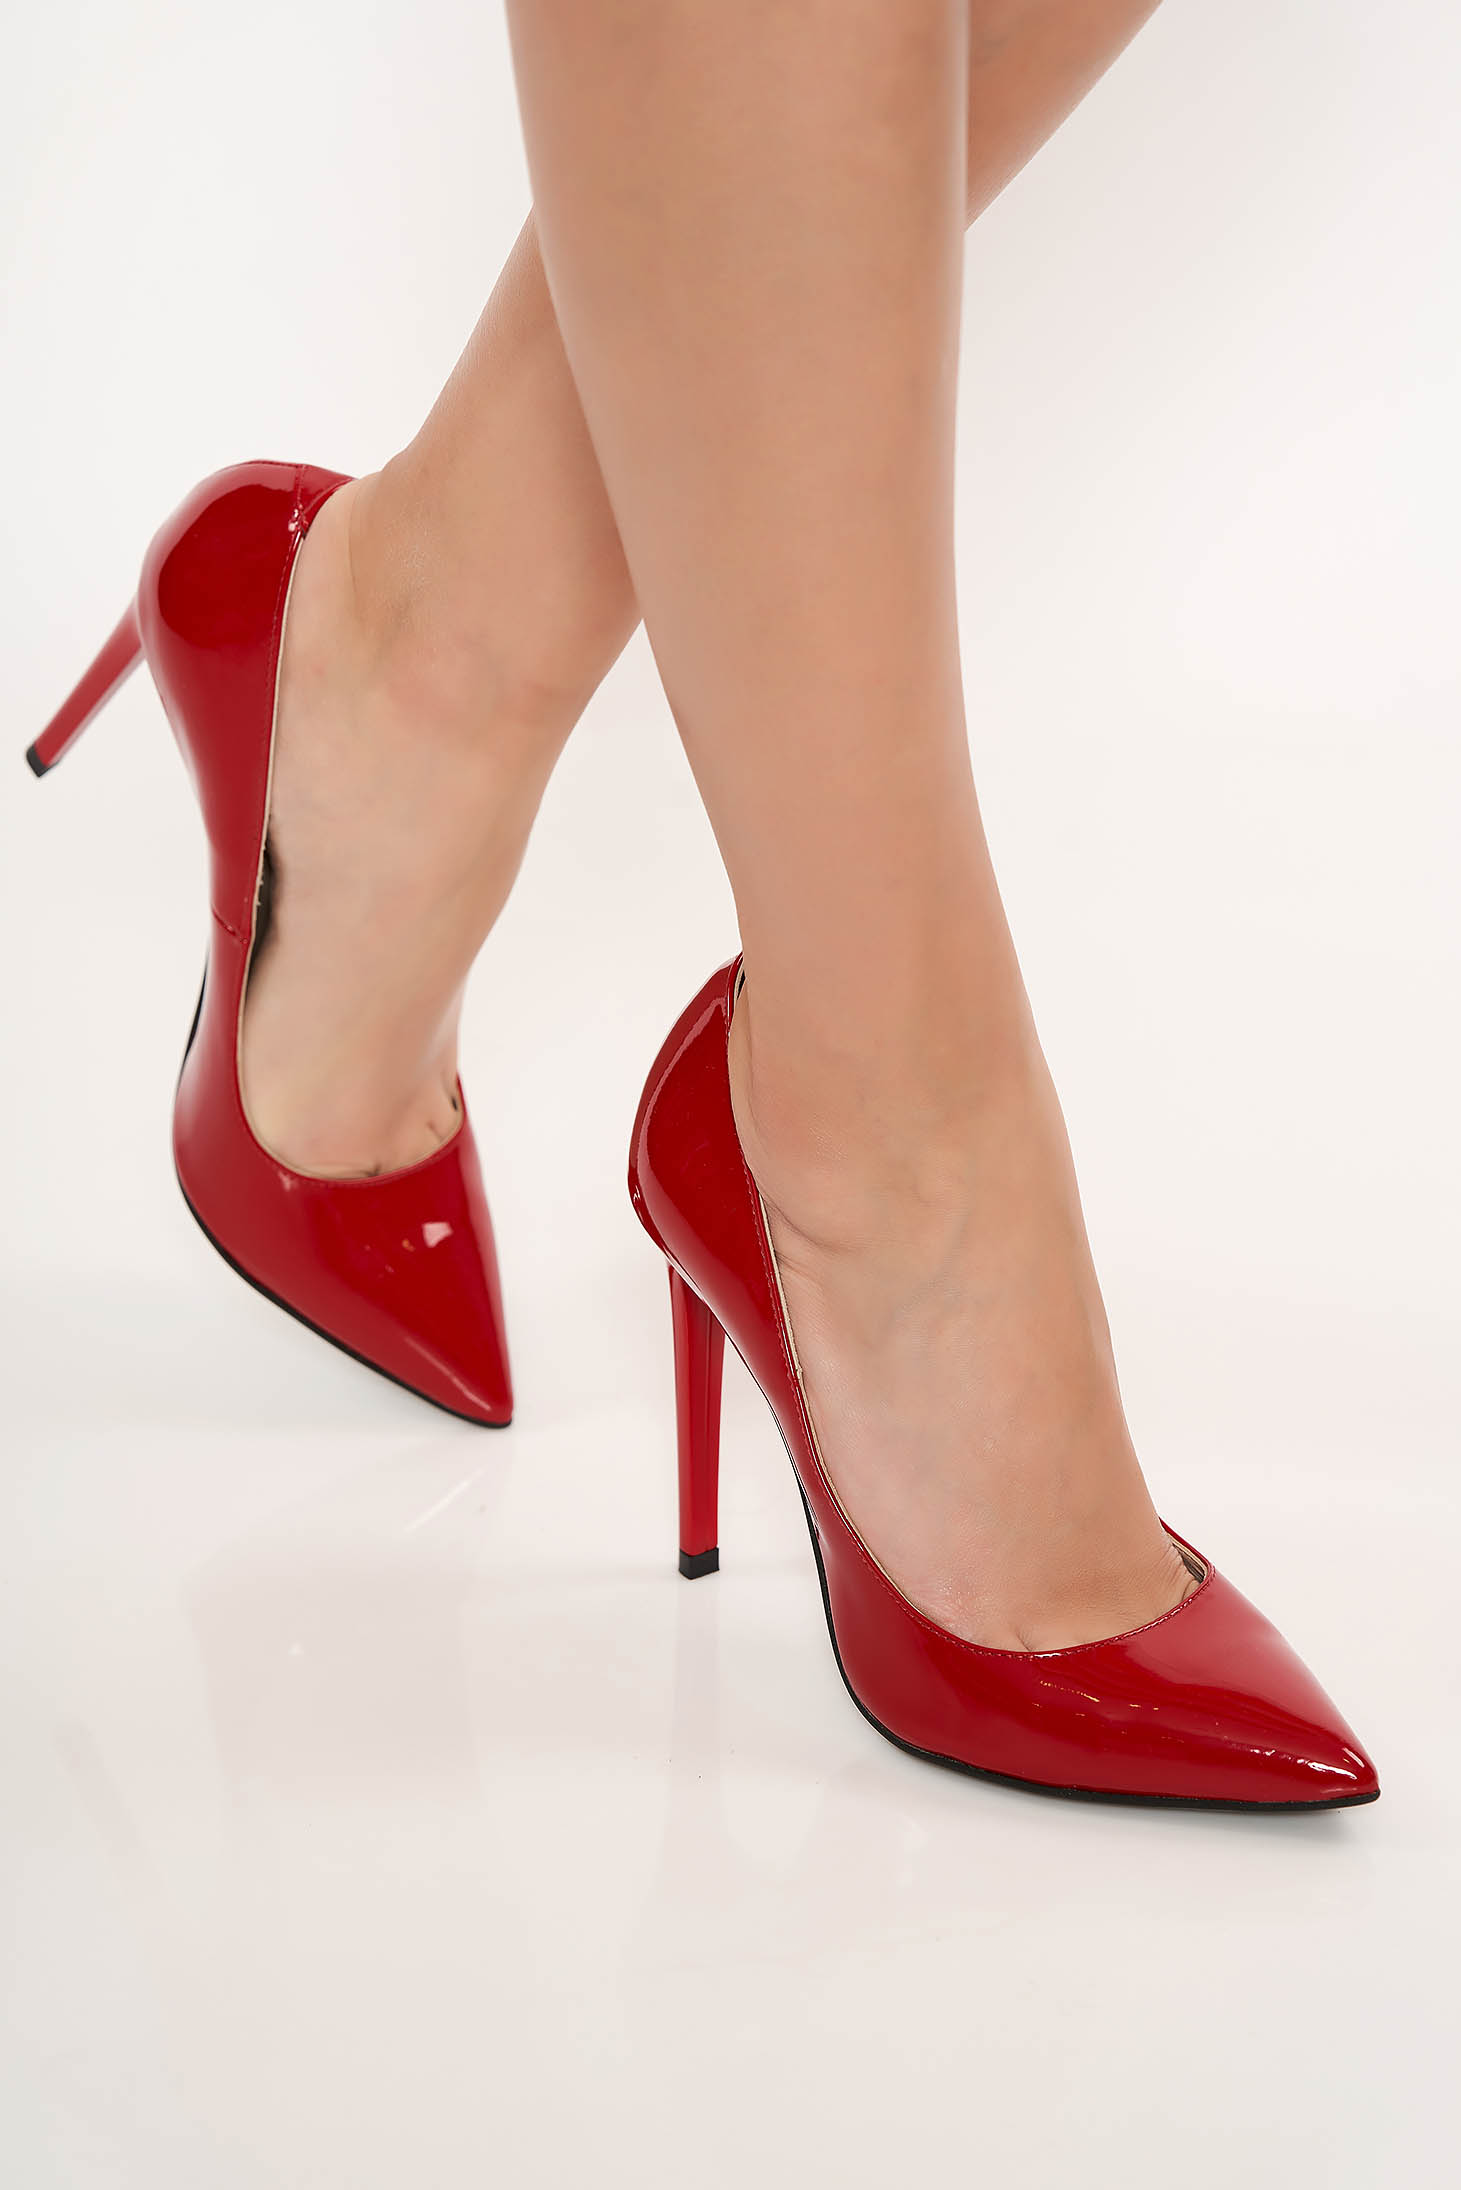 Pantofi rosi stiletto elegant din piele naturala cu toc inalt